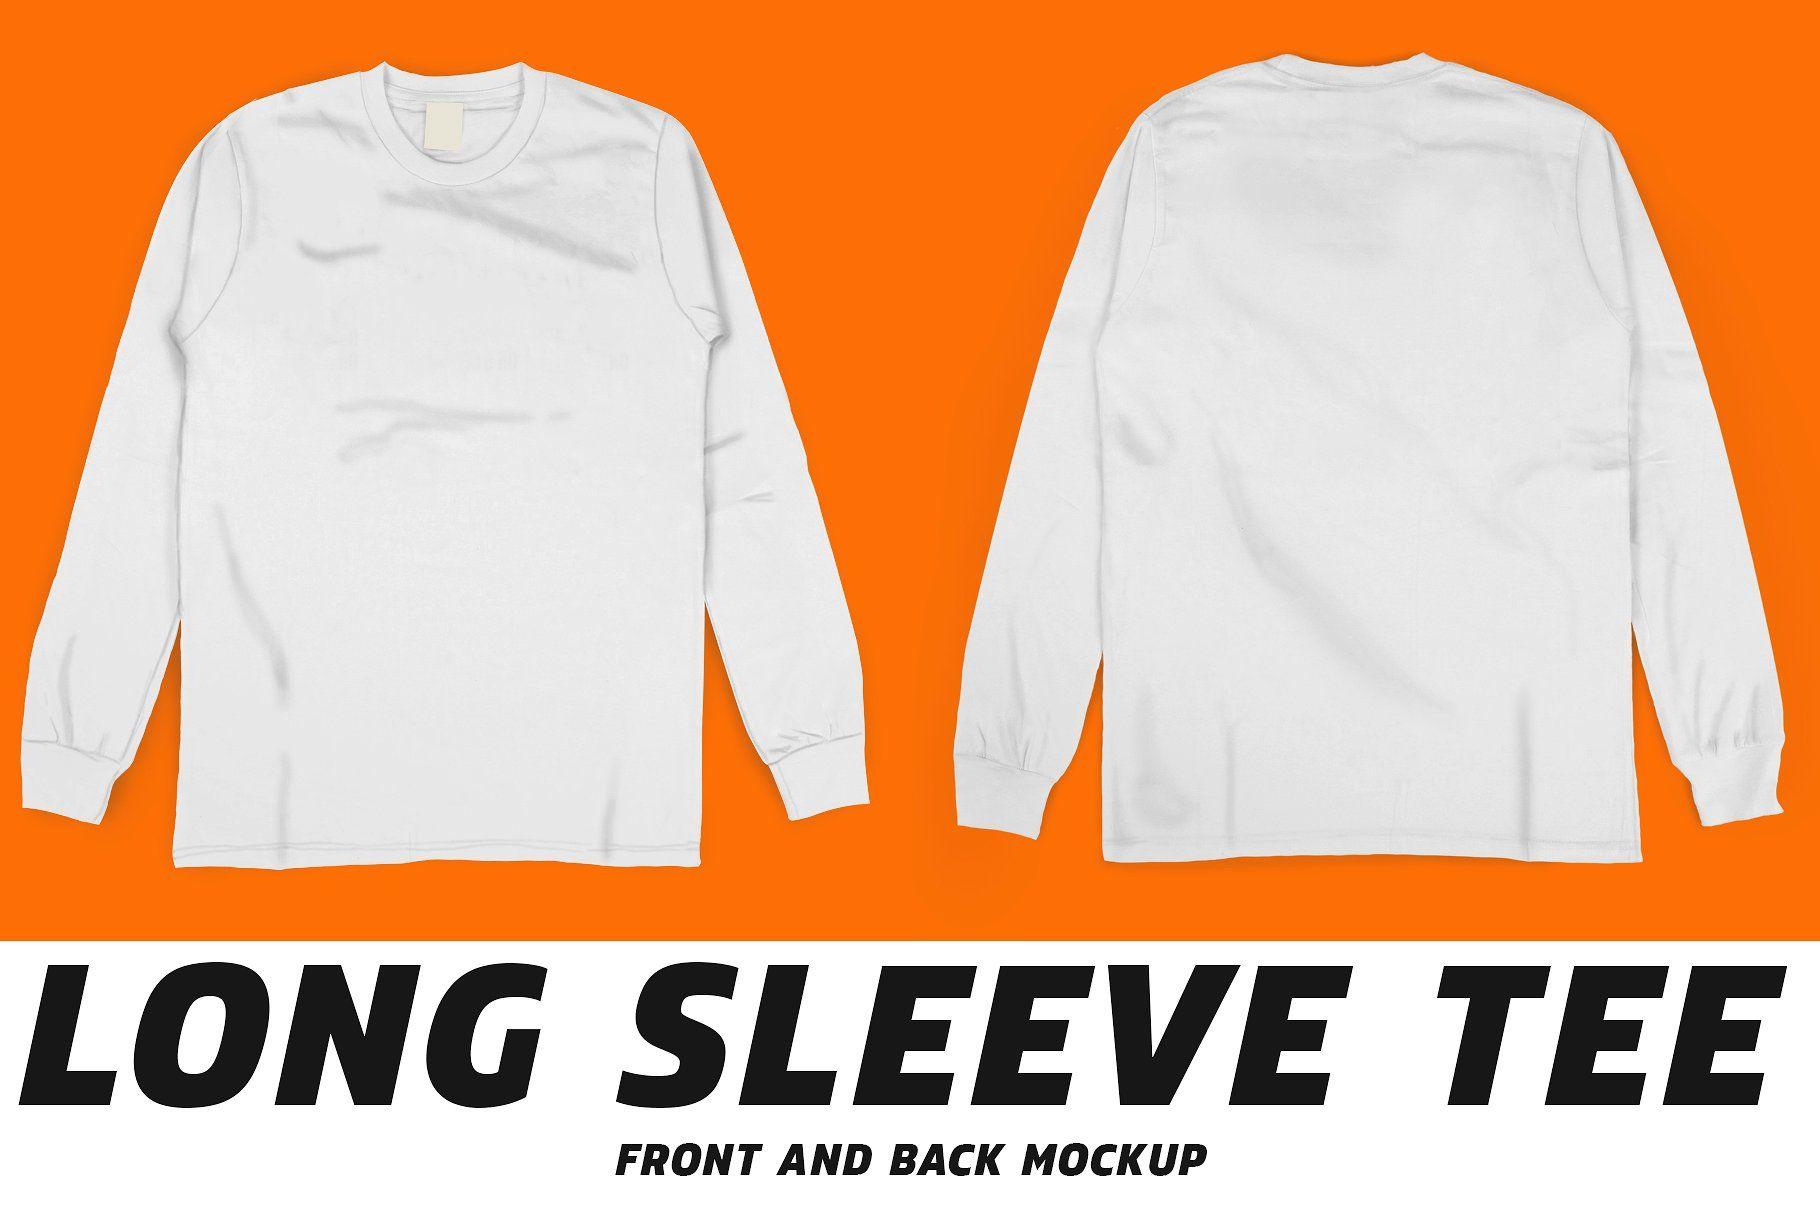 8002+ Long Sleeve T-Shirt Mockup Psd Free Photoshop File